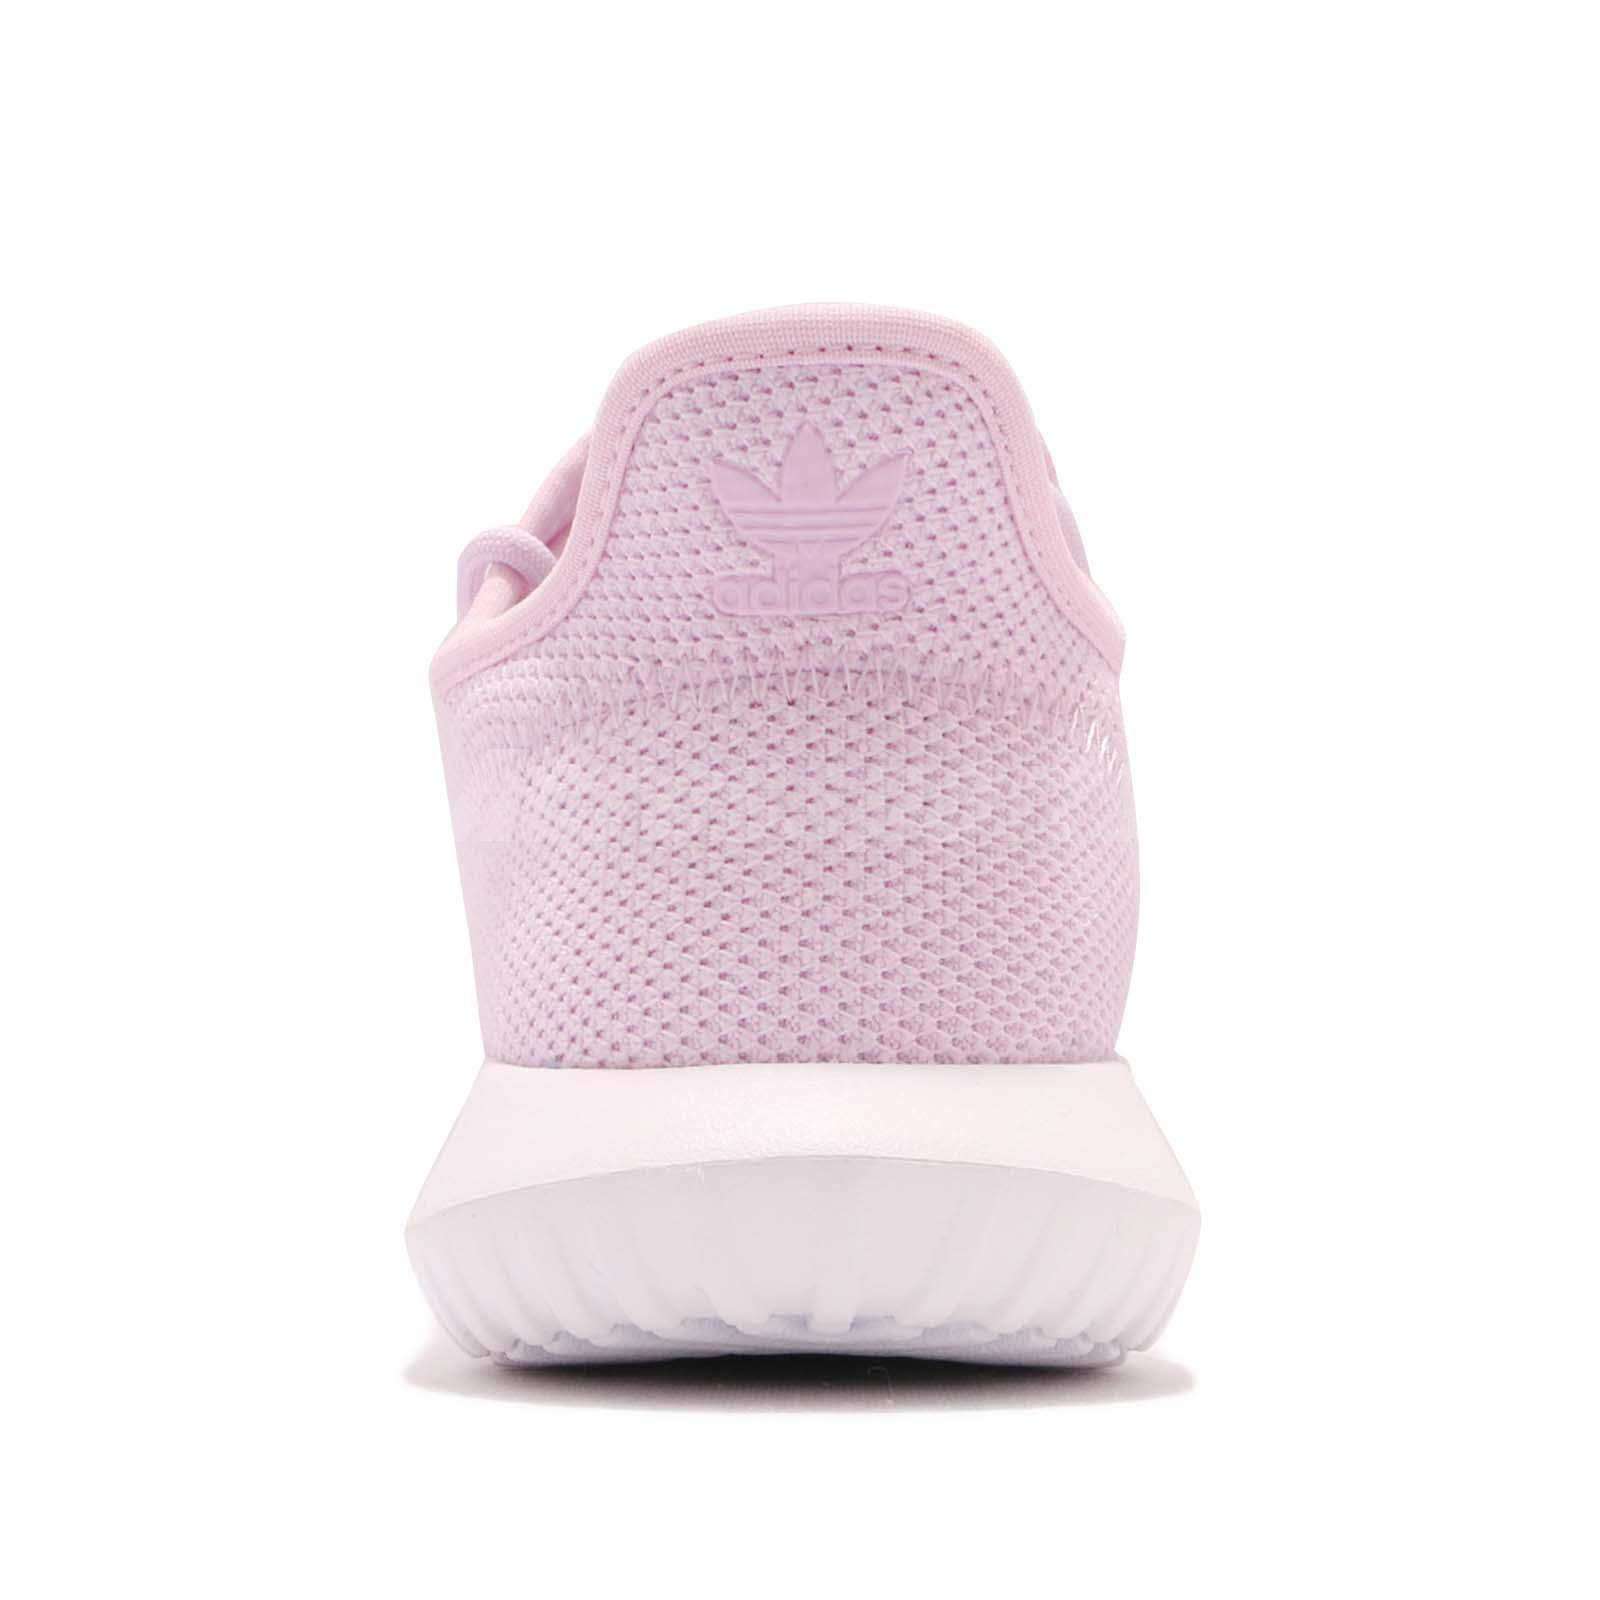 adidas Originals Tubular Shadow J Aero Pink White Kid Junior Running ... 1dd750d6c